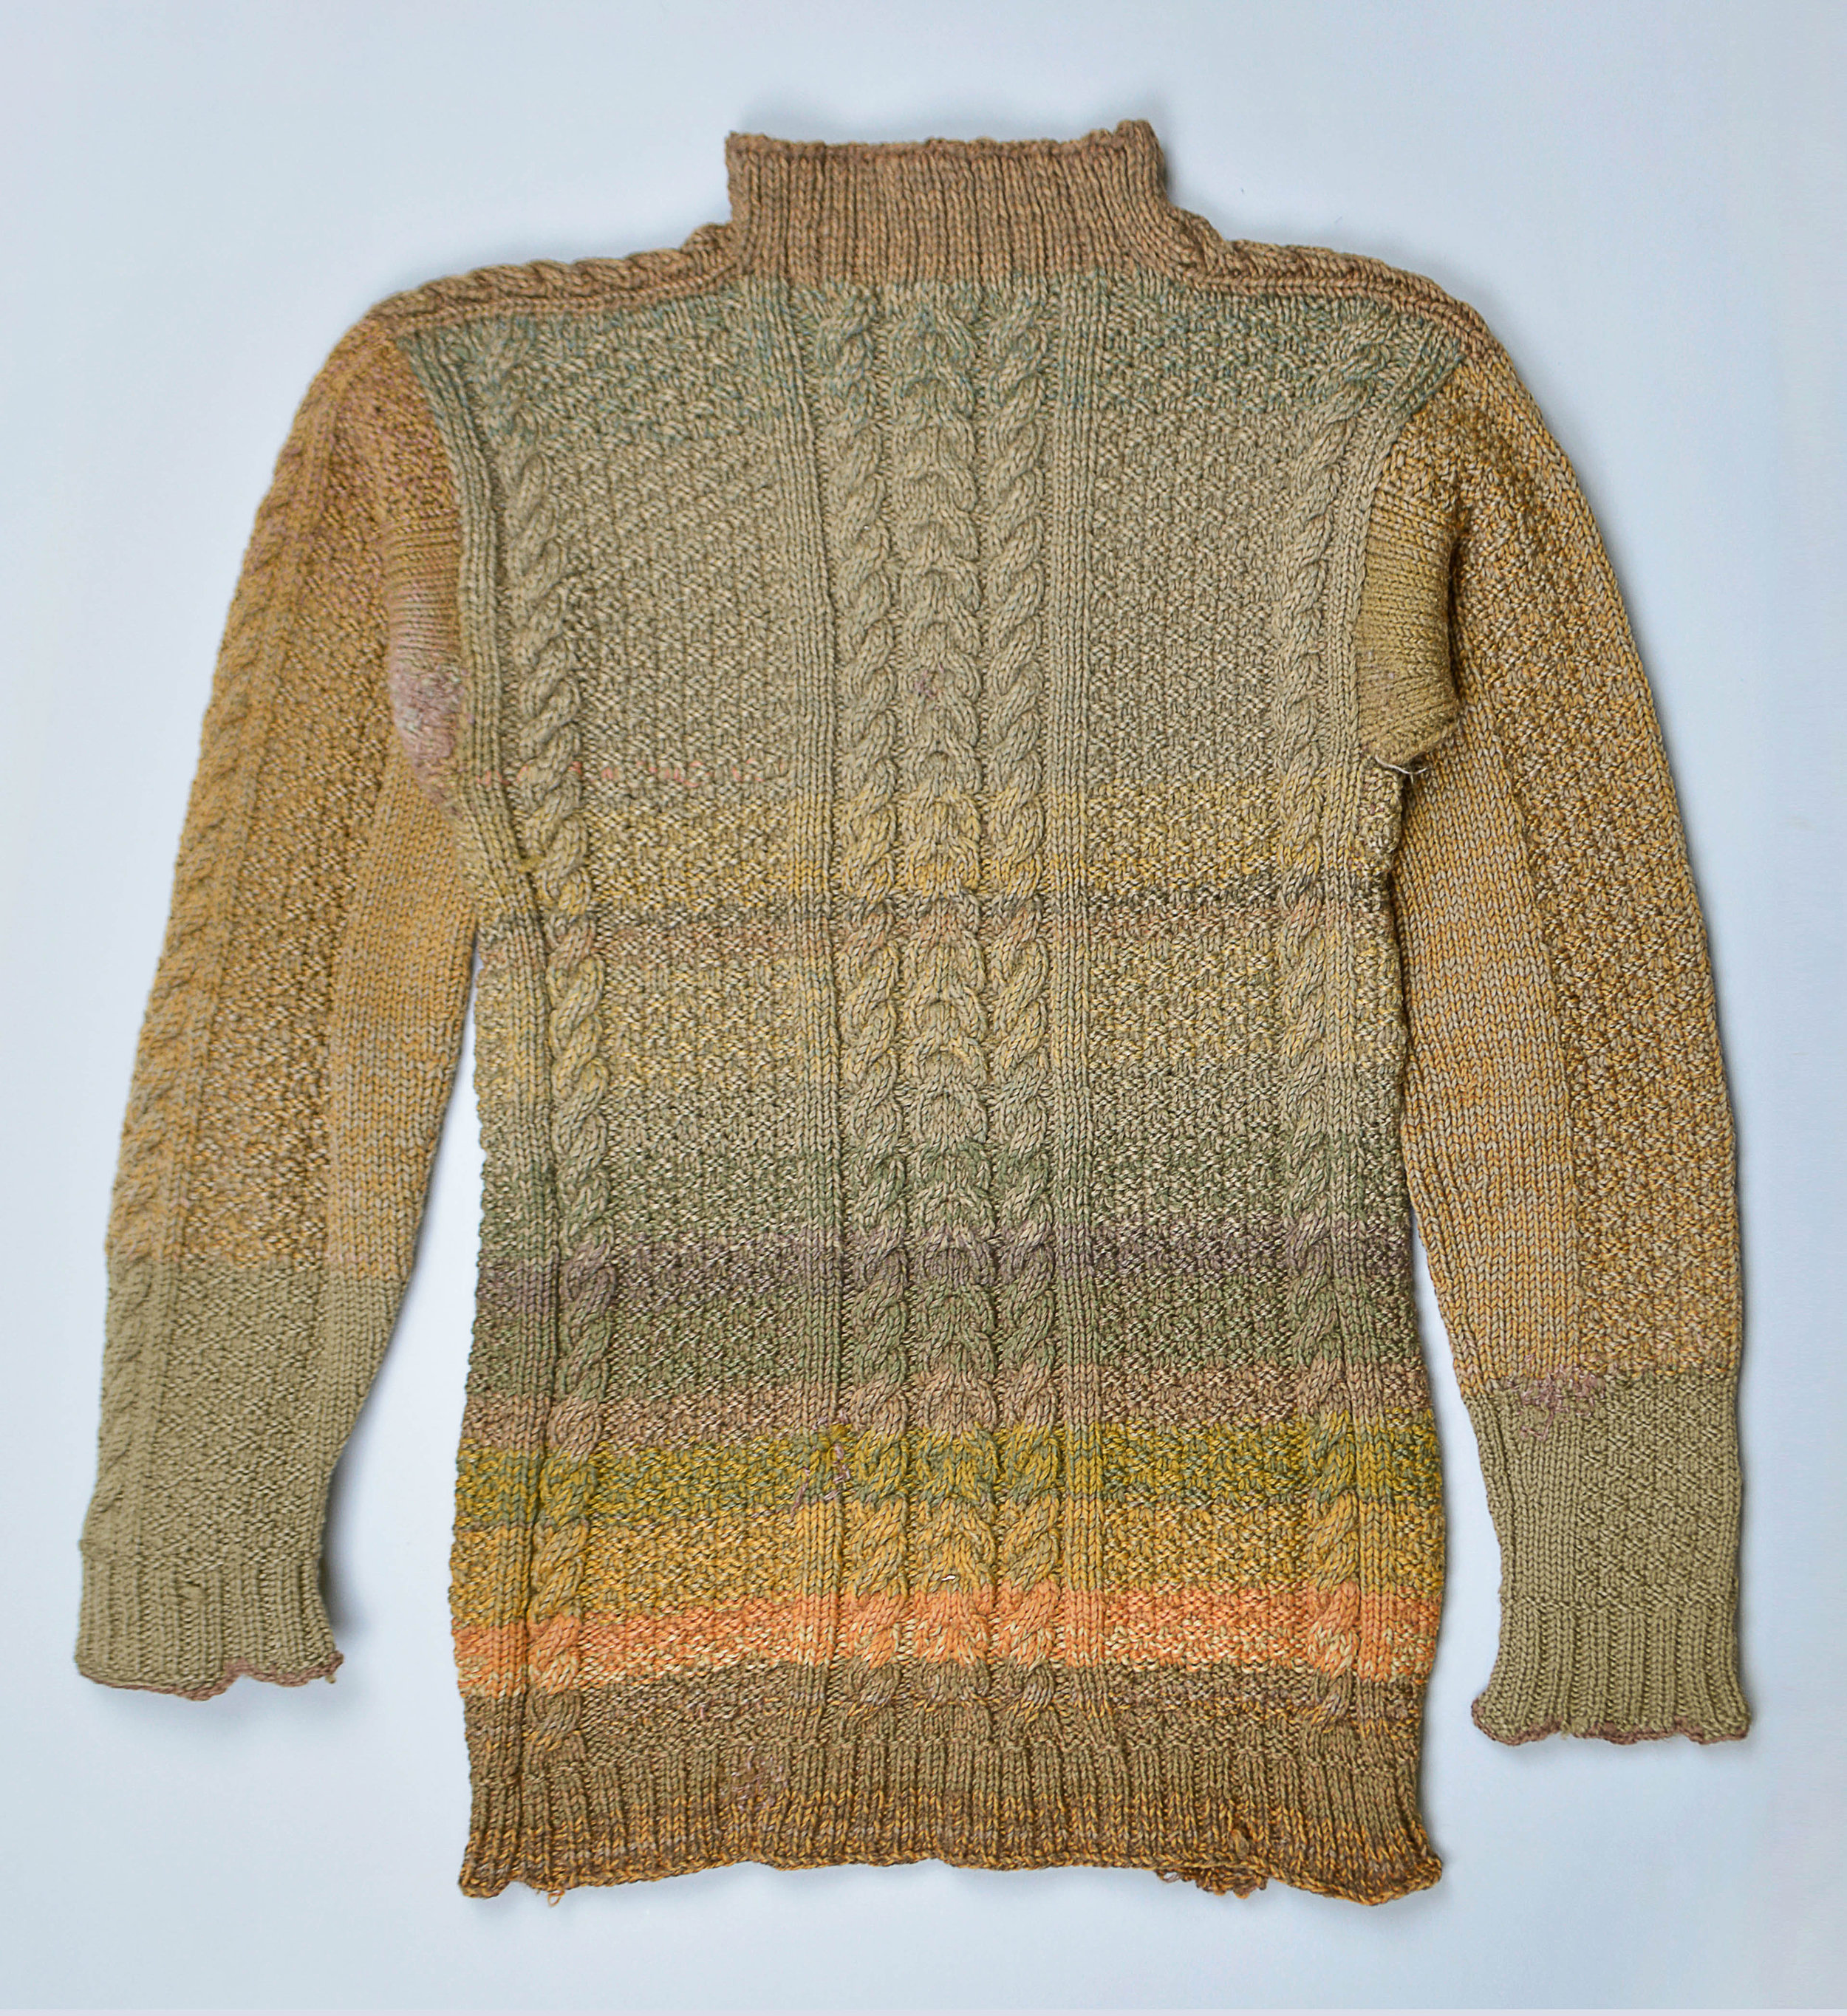 Robert Kelly, Sweater, Wool, 67.0 x 40.0 cm. Collection of Glenbow Museum, Calgary, AB, C-10639. Photo: Gabriela García-Luna, Moose Jaw Museum & Art Gallery